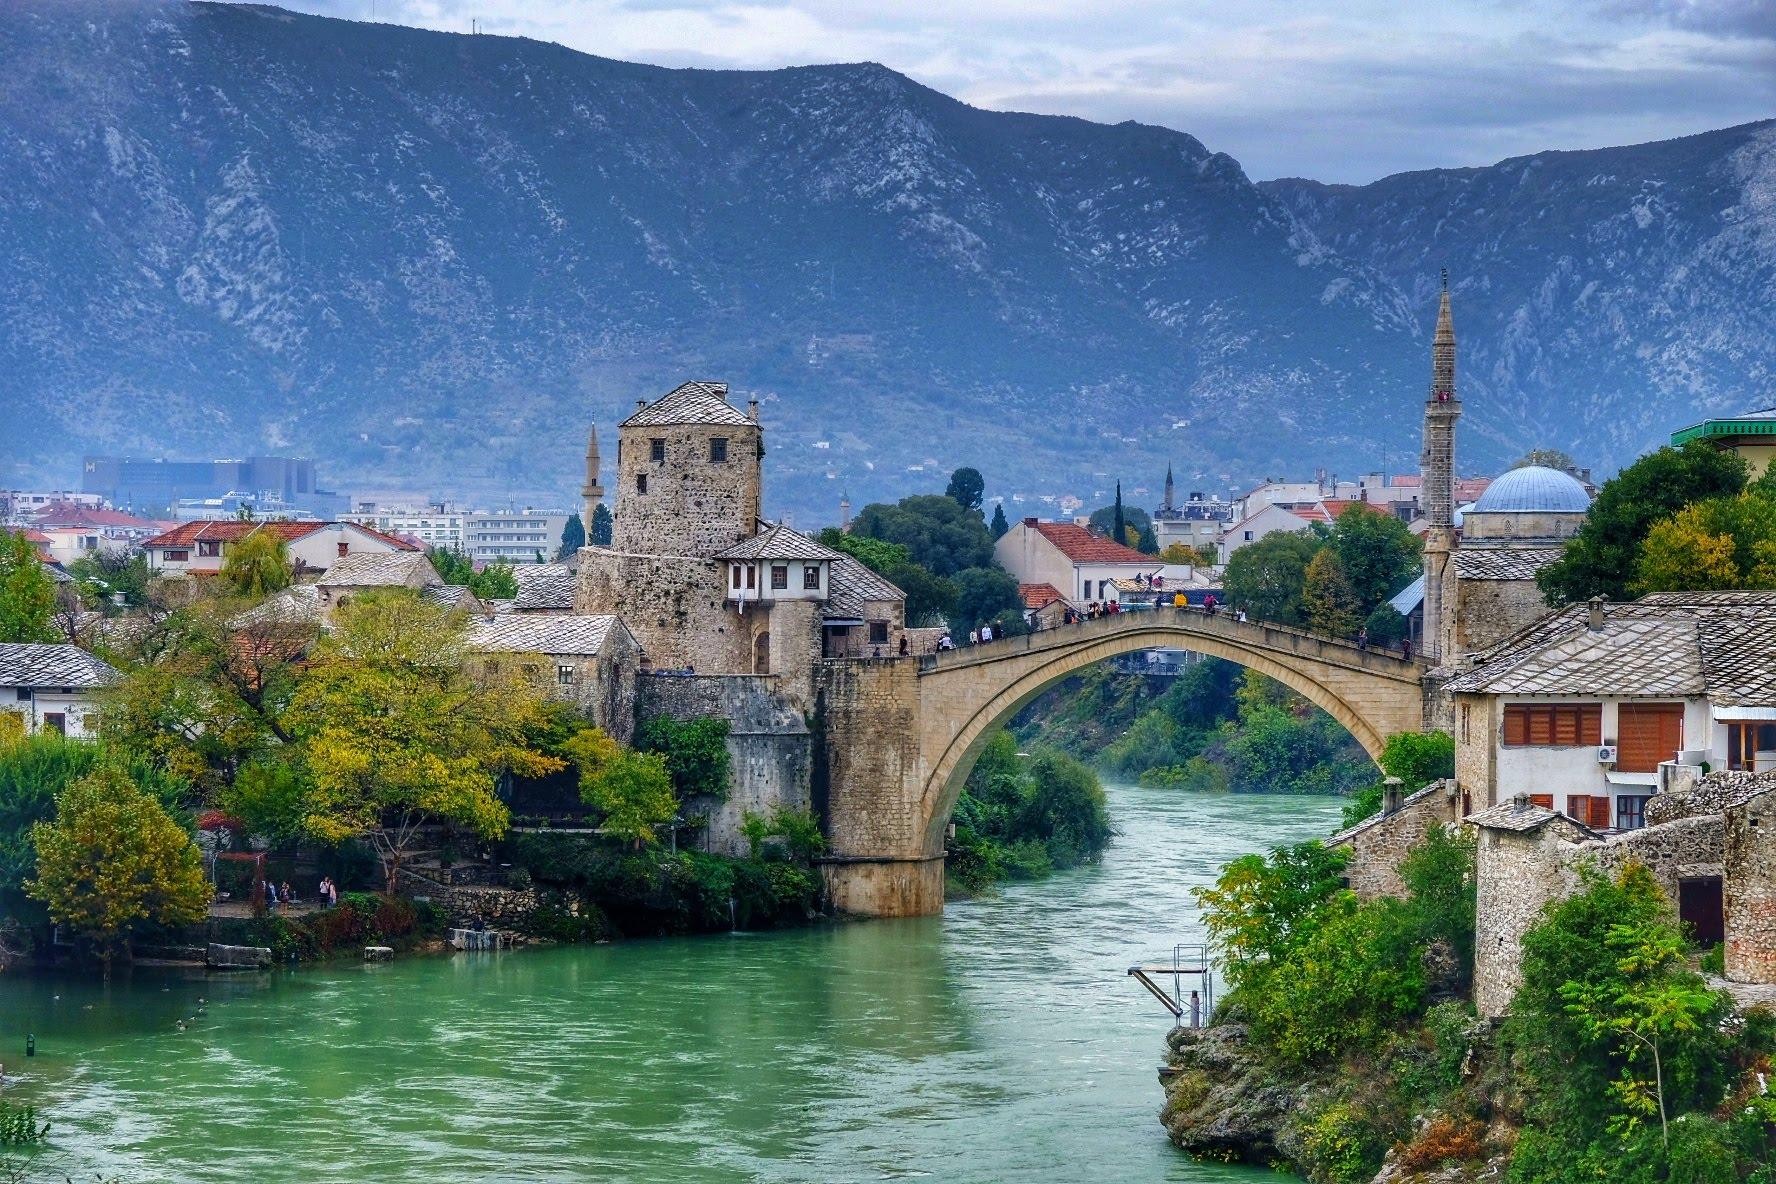 Mostar, The Old Bridge, Bosnia and Herzegovina